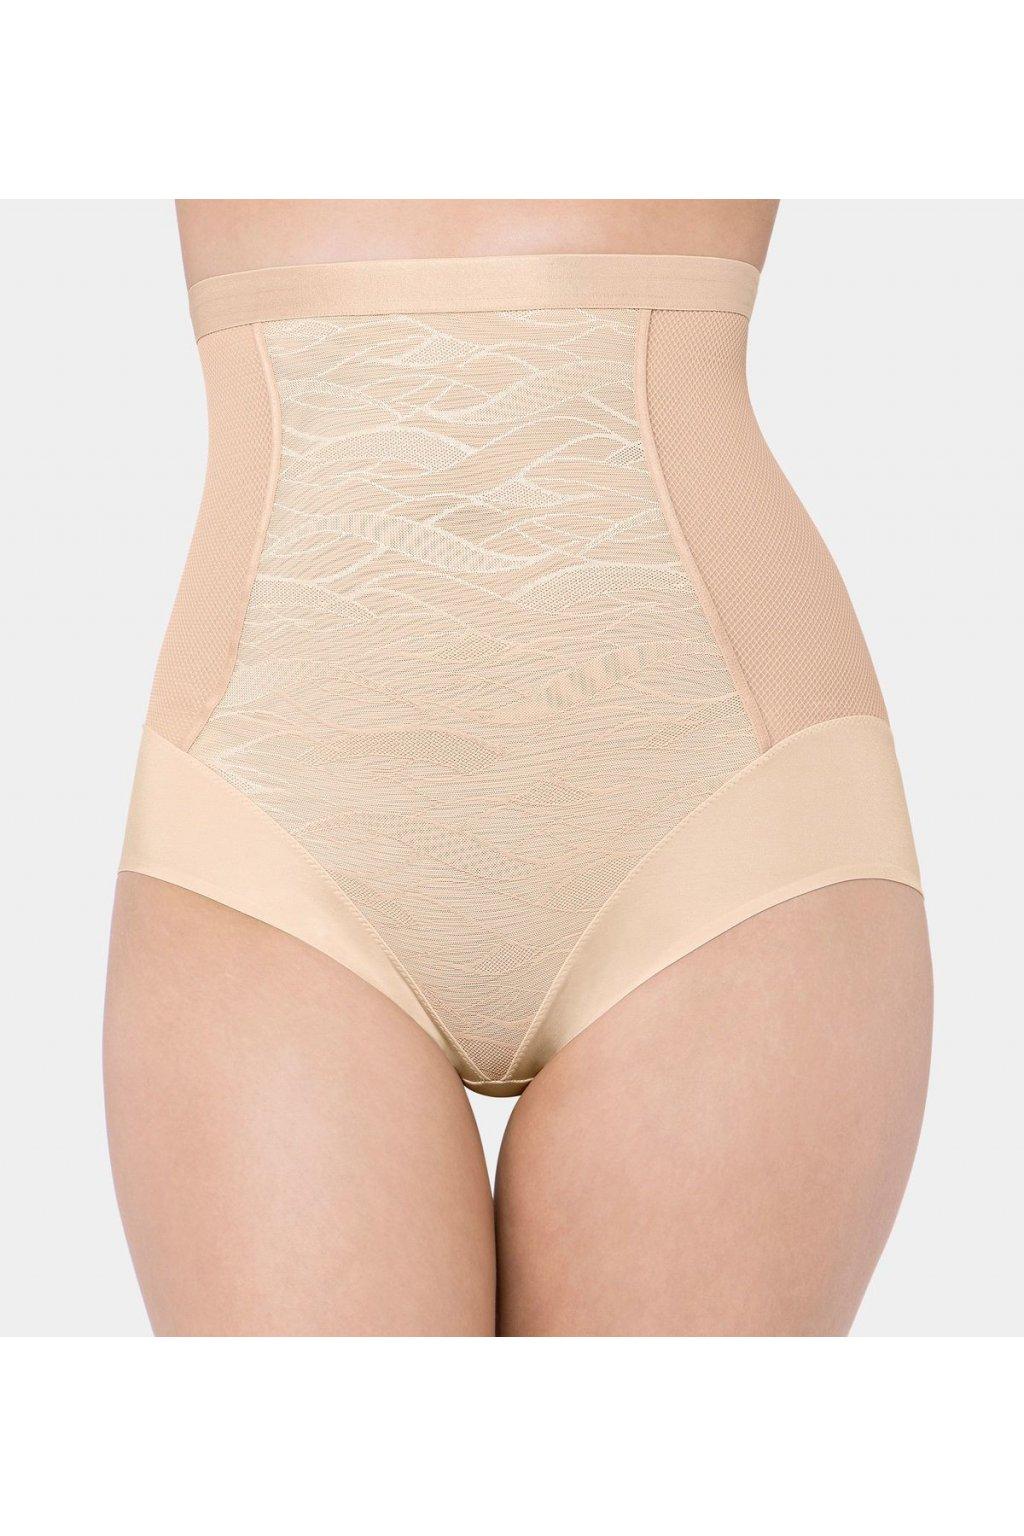 Stahovací kalhotky Airy Sensation Highwaist Panty 01 - Triumph